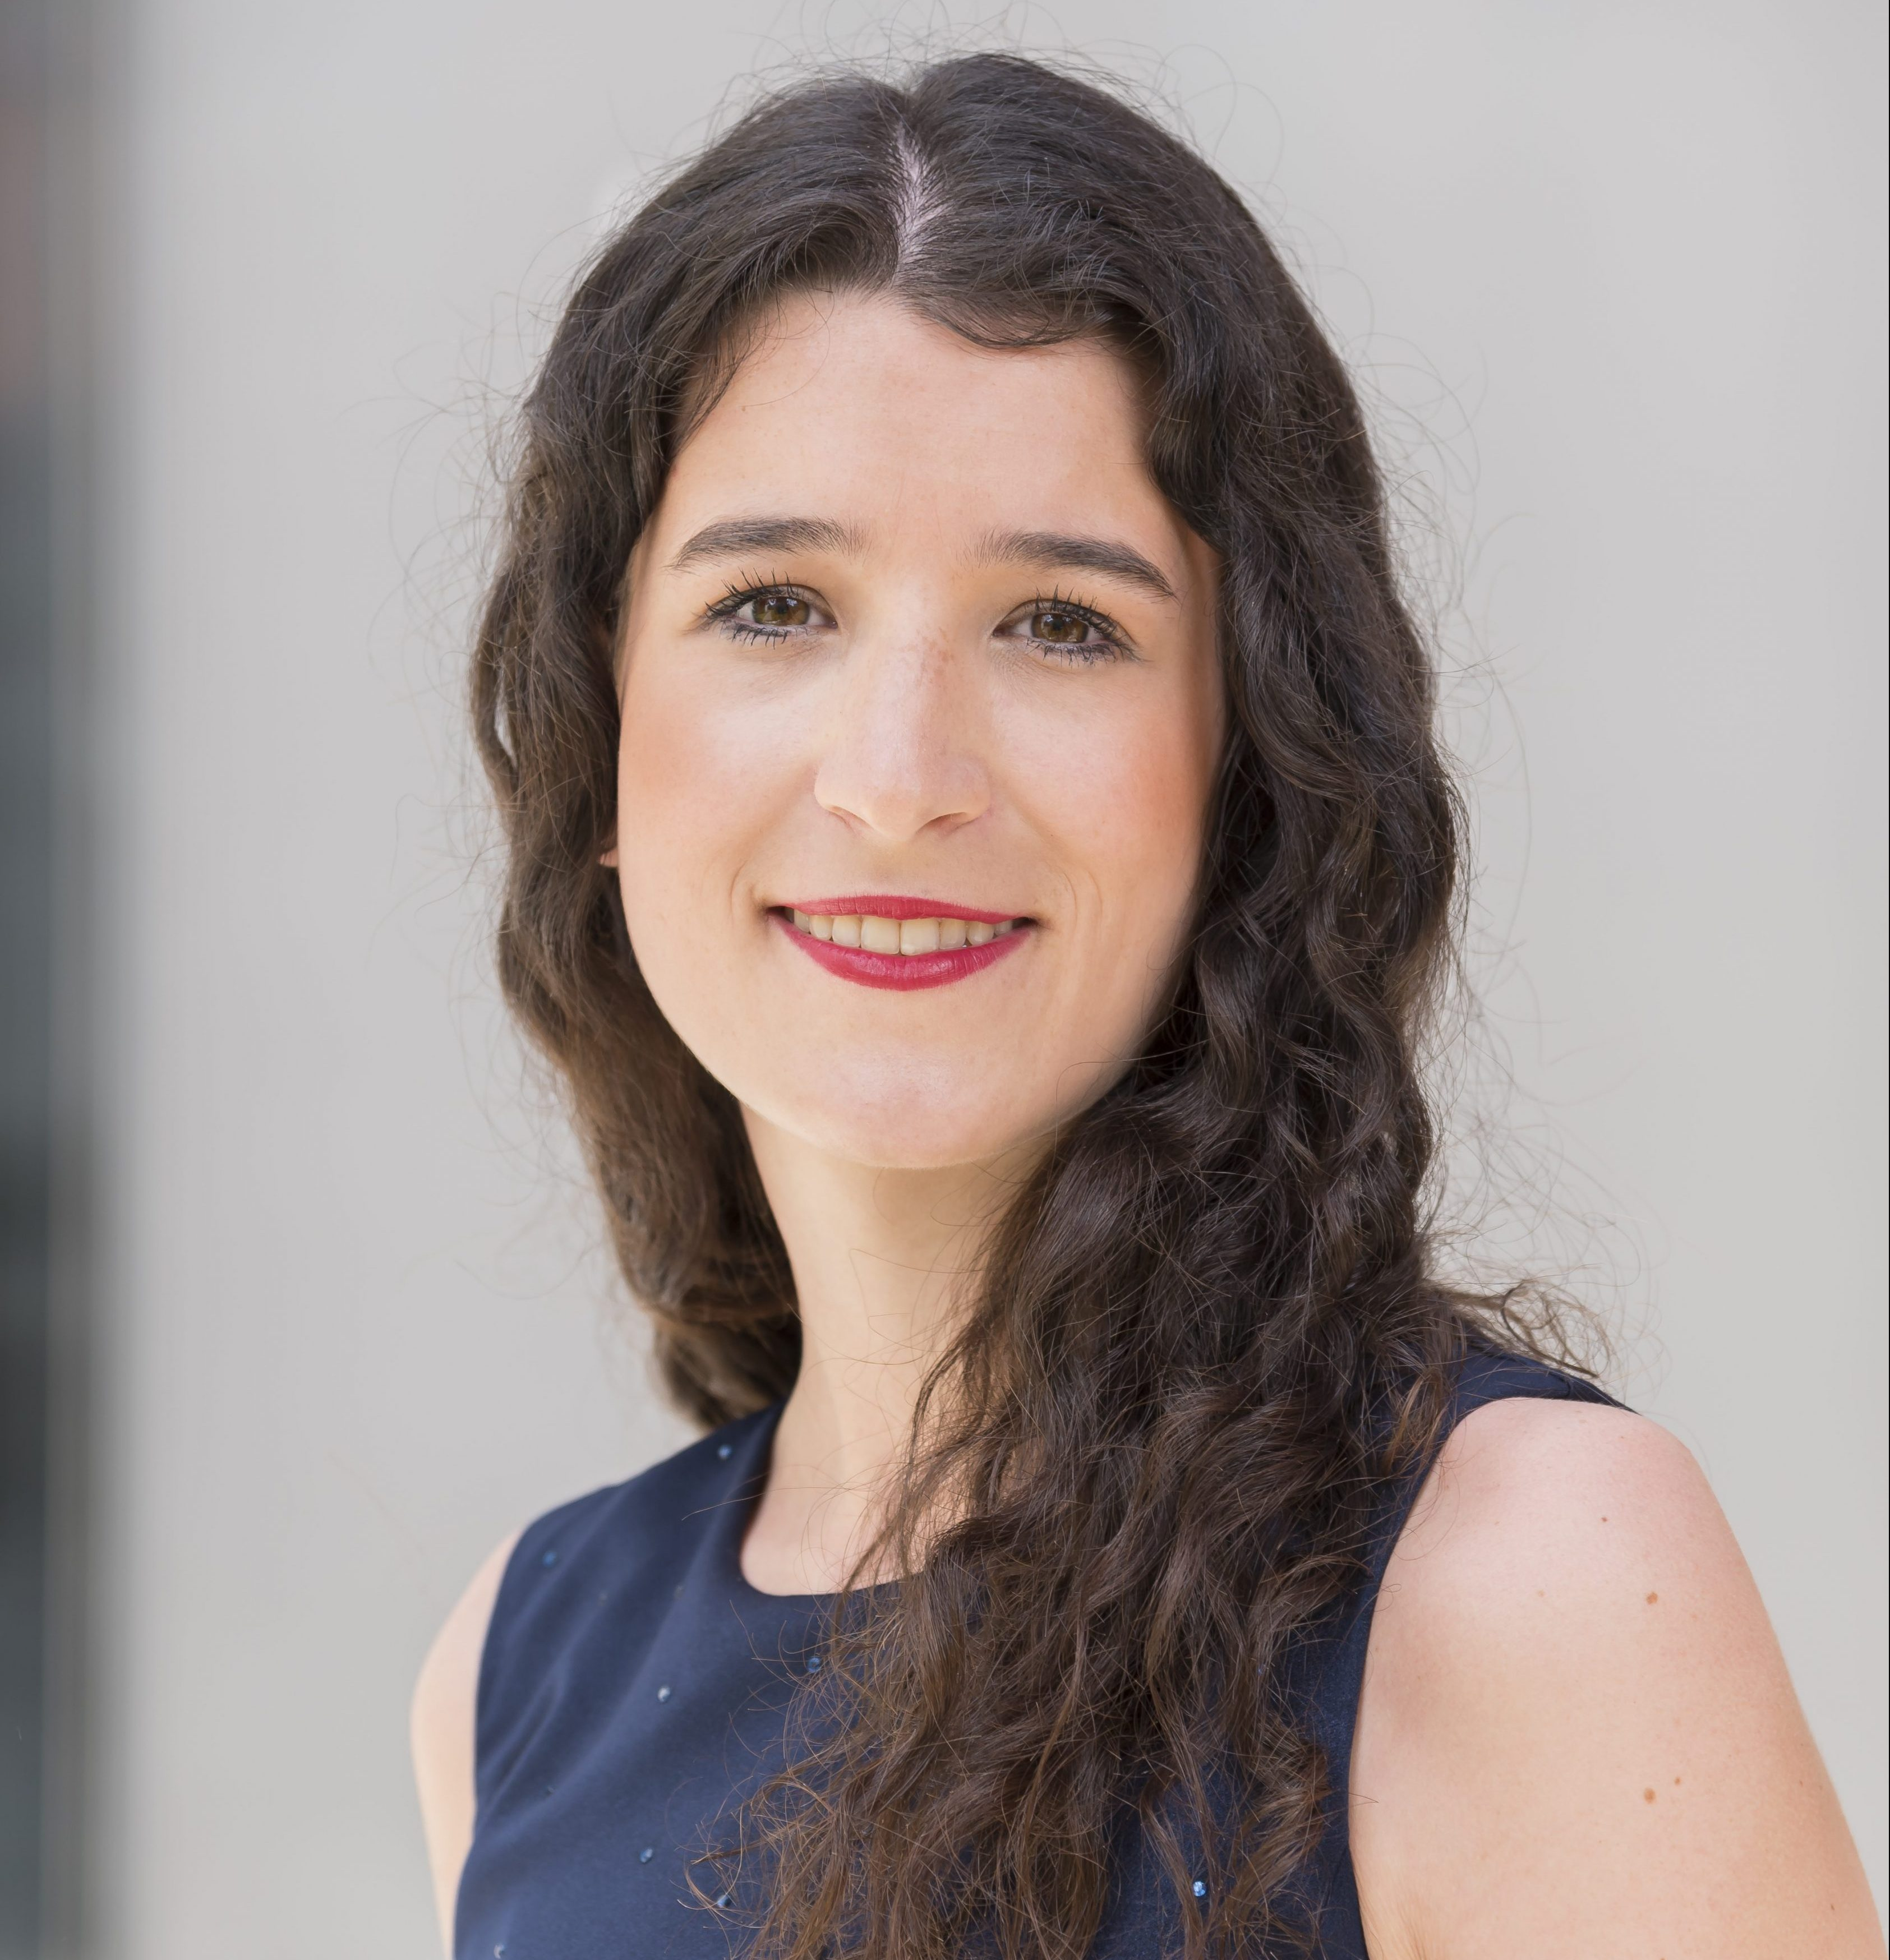 Teresa NeulichedlDr.  | Consultant